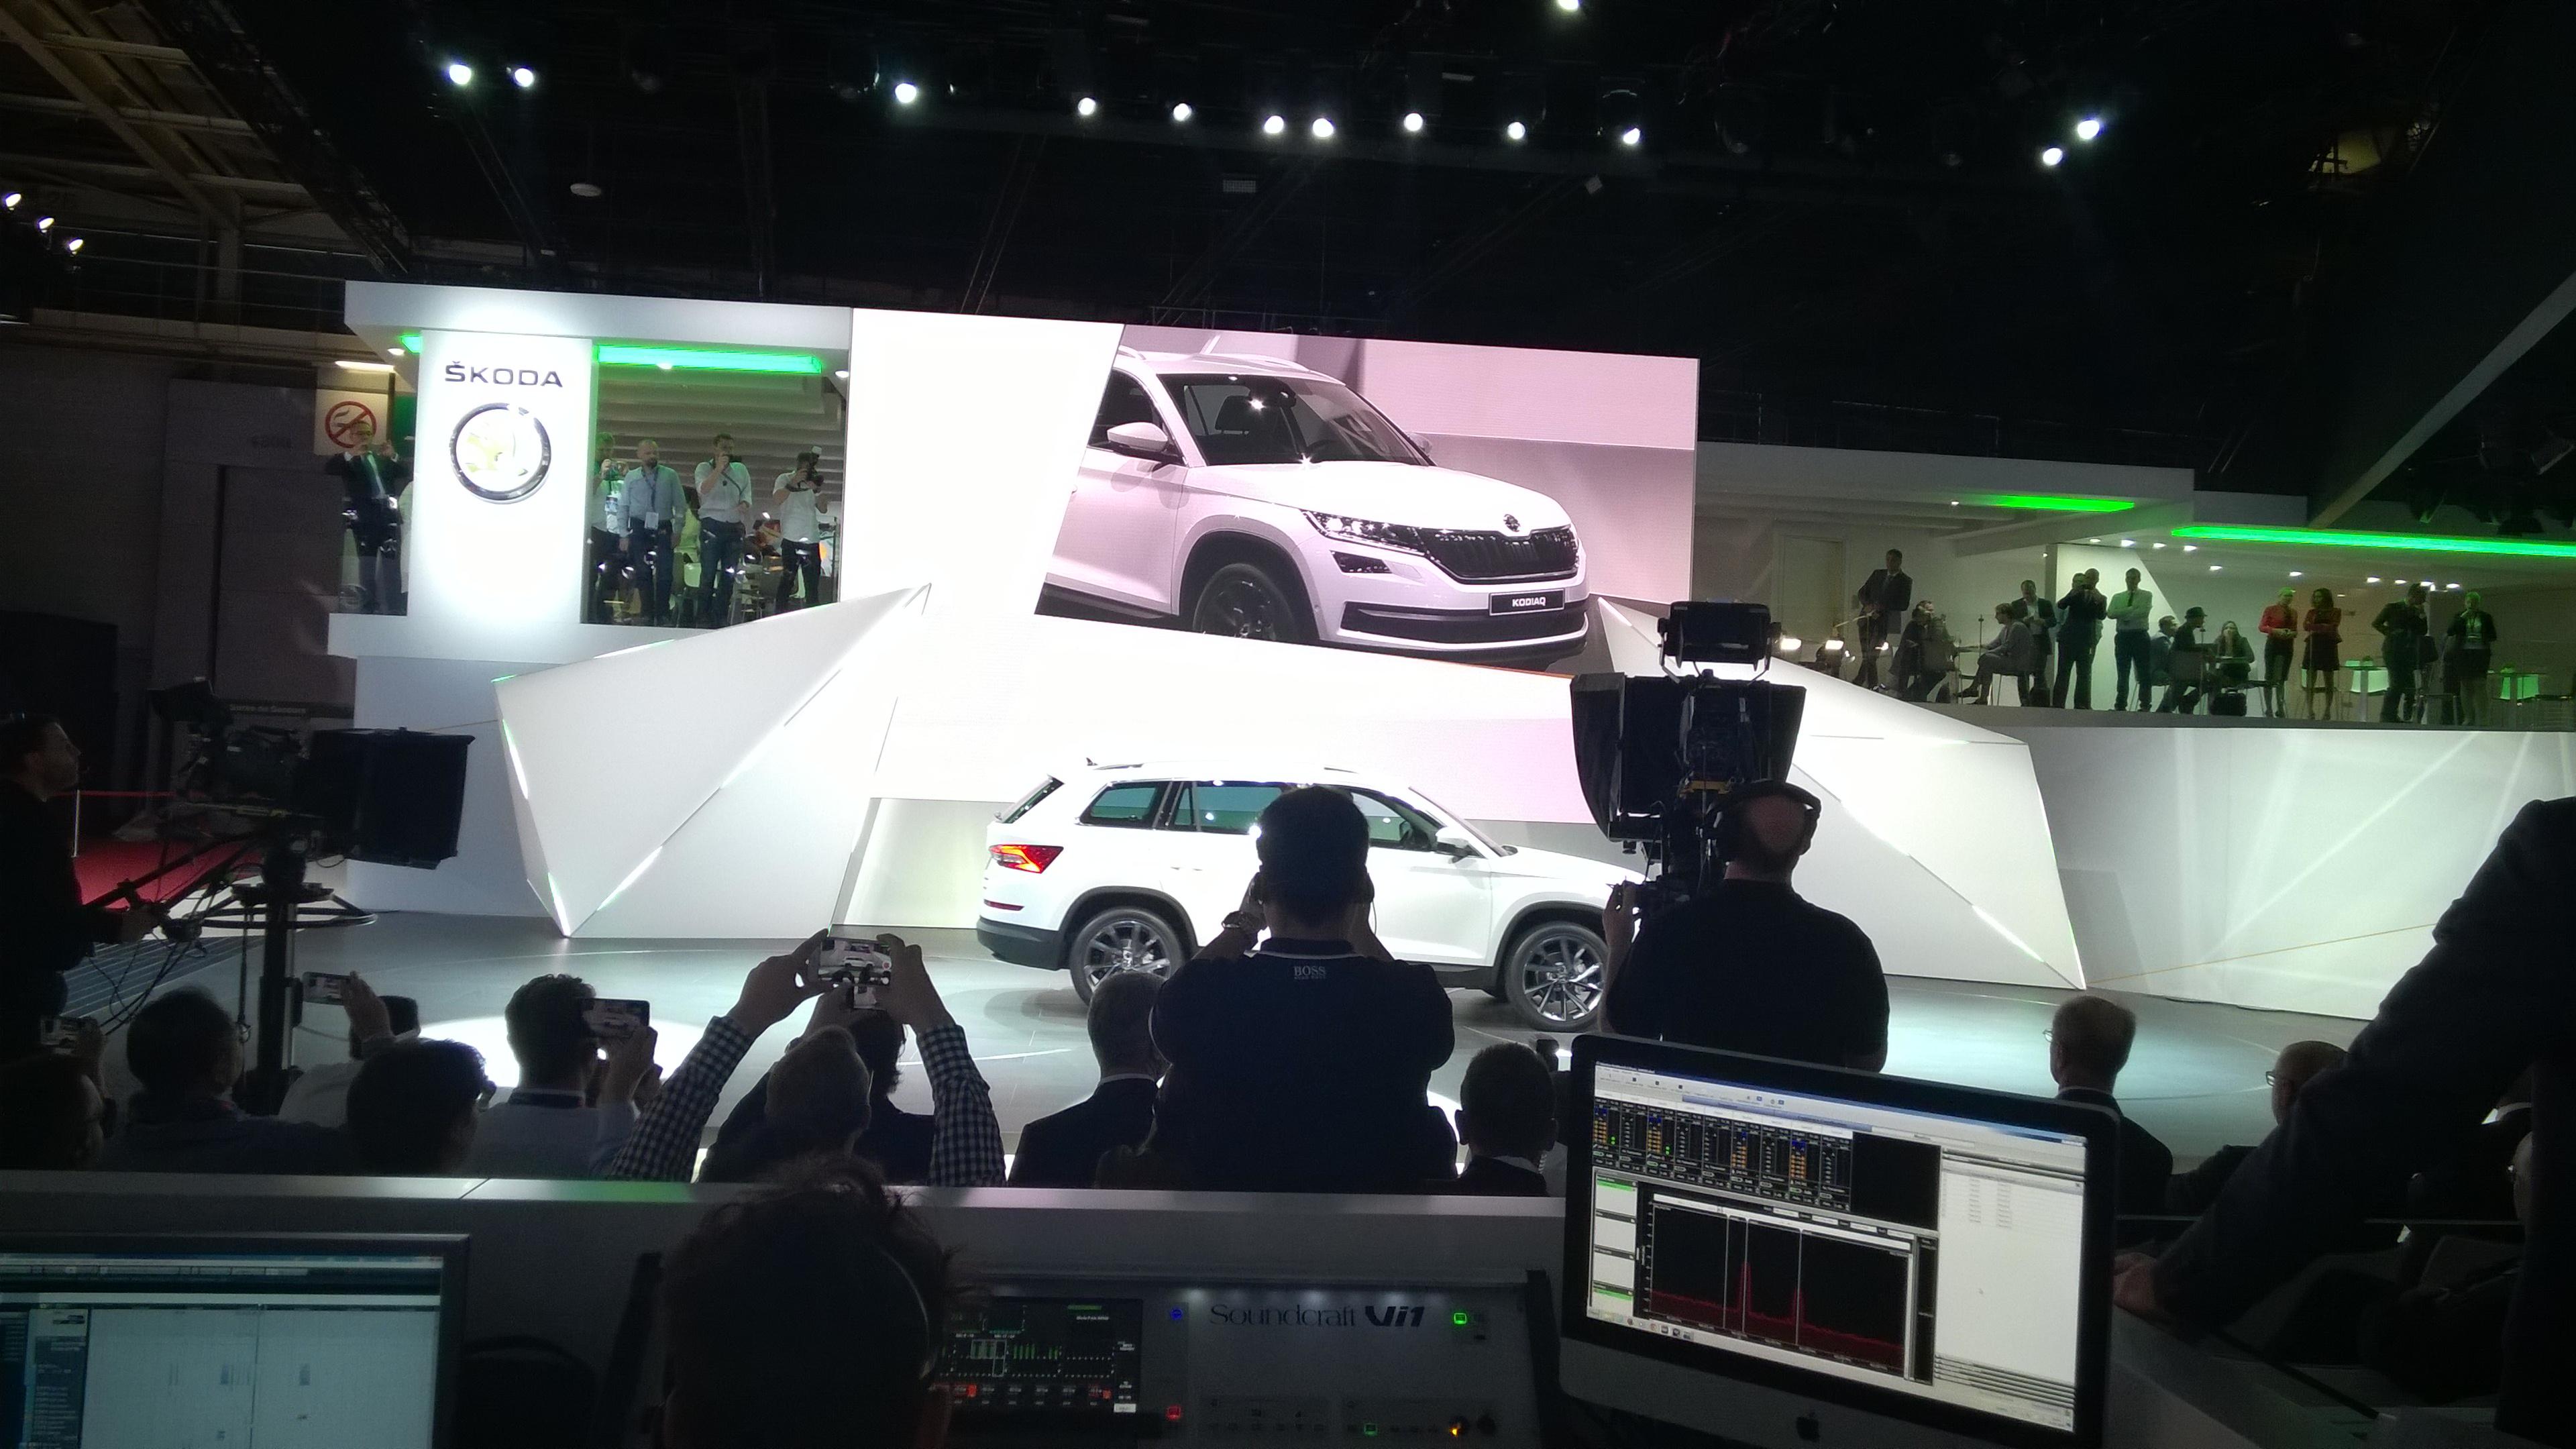 Skoda Kodiaq world premiere at Paris Motor Show 2016